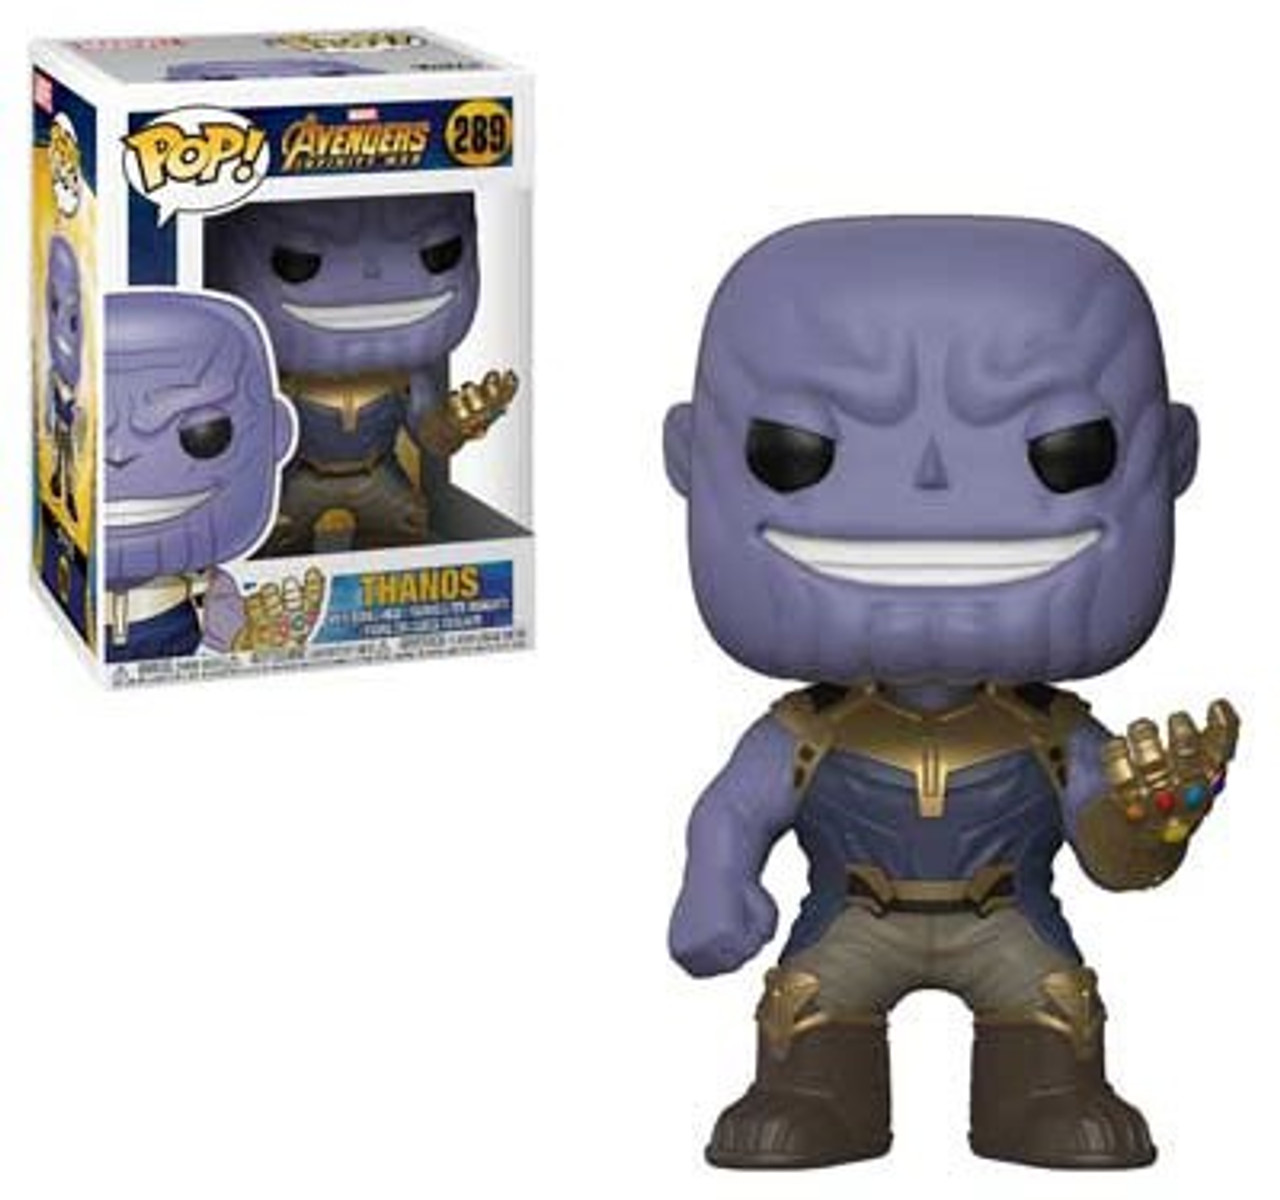 ee46a5b02fe Funko Marvel Universe Avengers Infinity War Funko POP Marvel Thanos Vinyl  Figure 289 Regular Version - ToyWiz